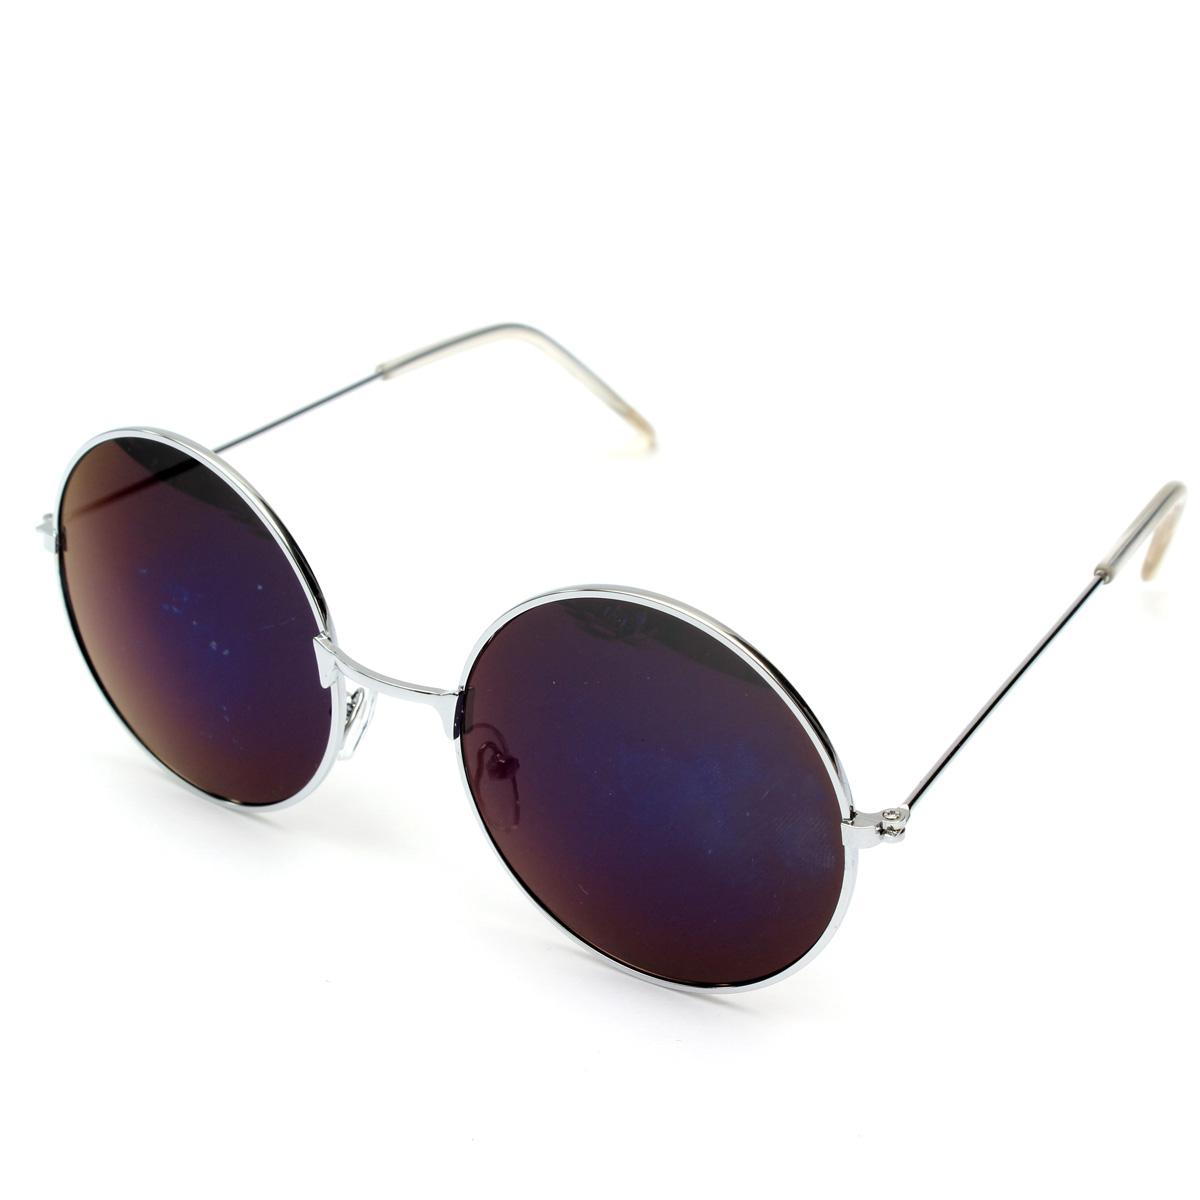 Fresh Retro Vintage Men Women Big Round Metal Frame Sunglasses Glasses  XY17